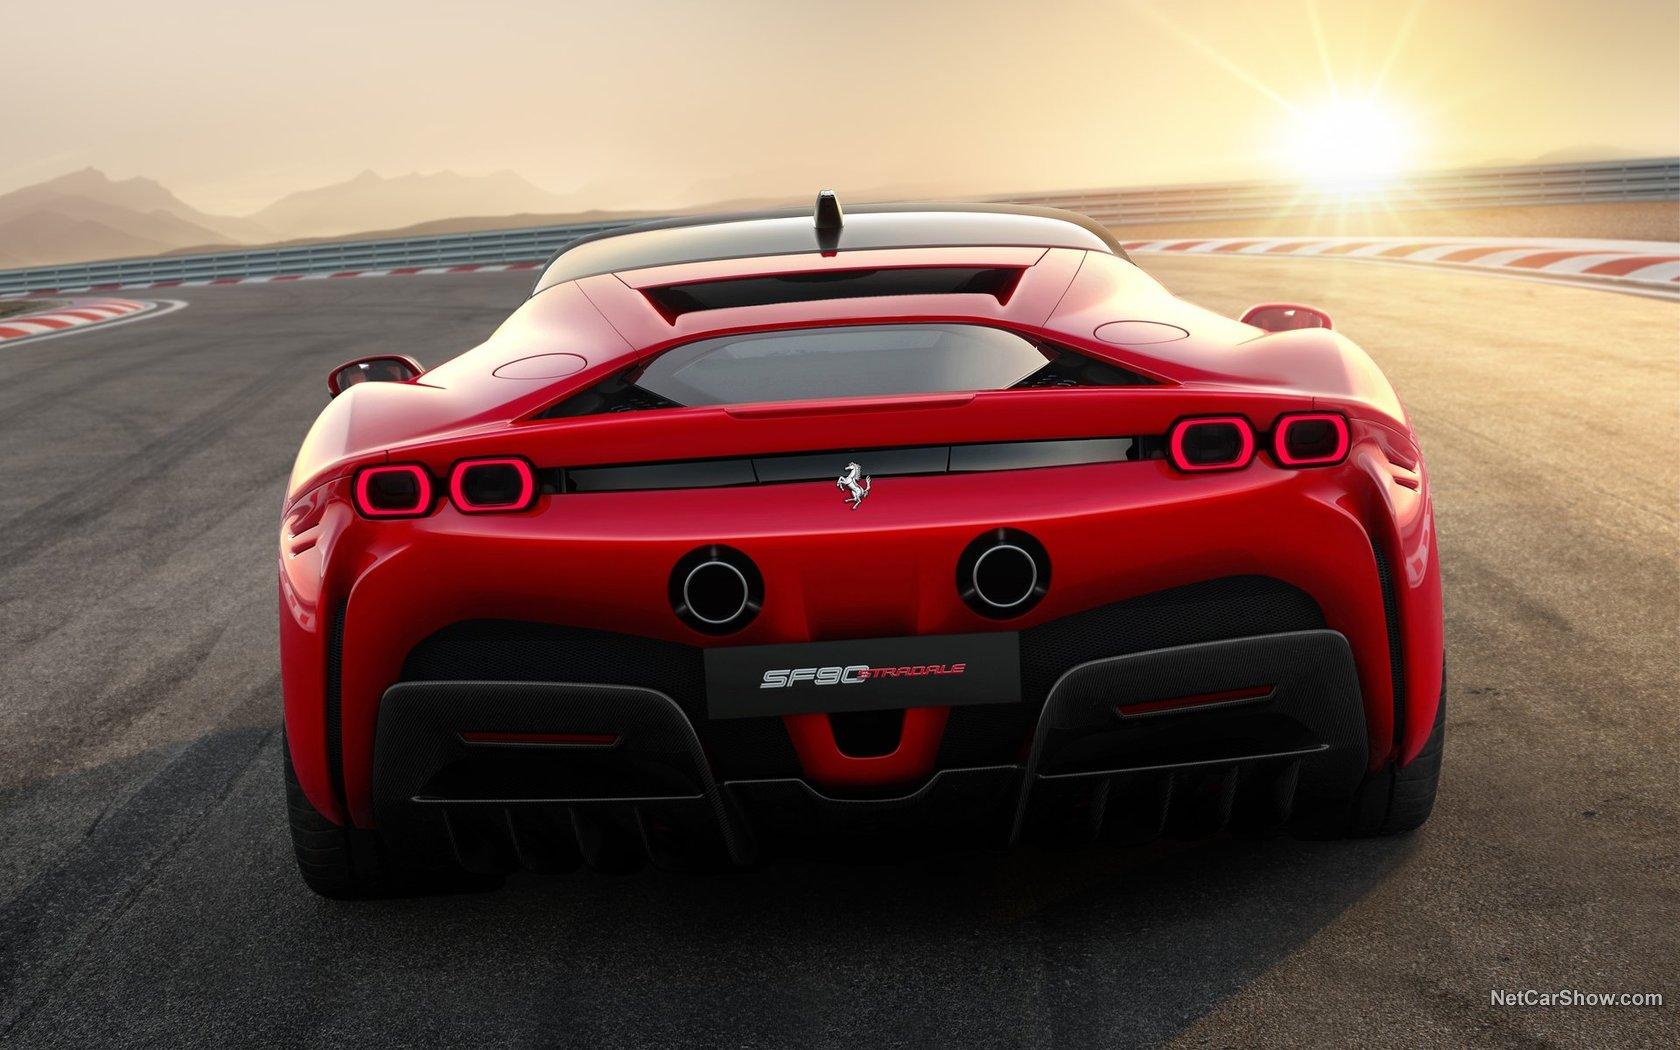 Superautomobil sa prednjim pogonom - Ferrari SF90 Stradale